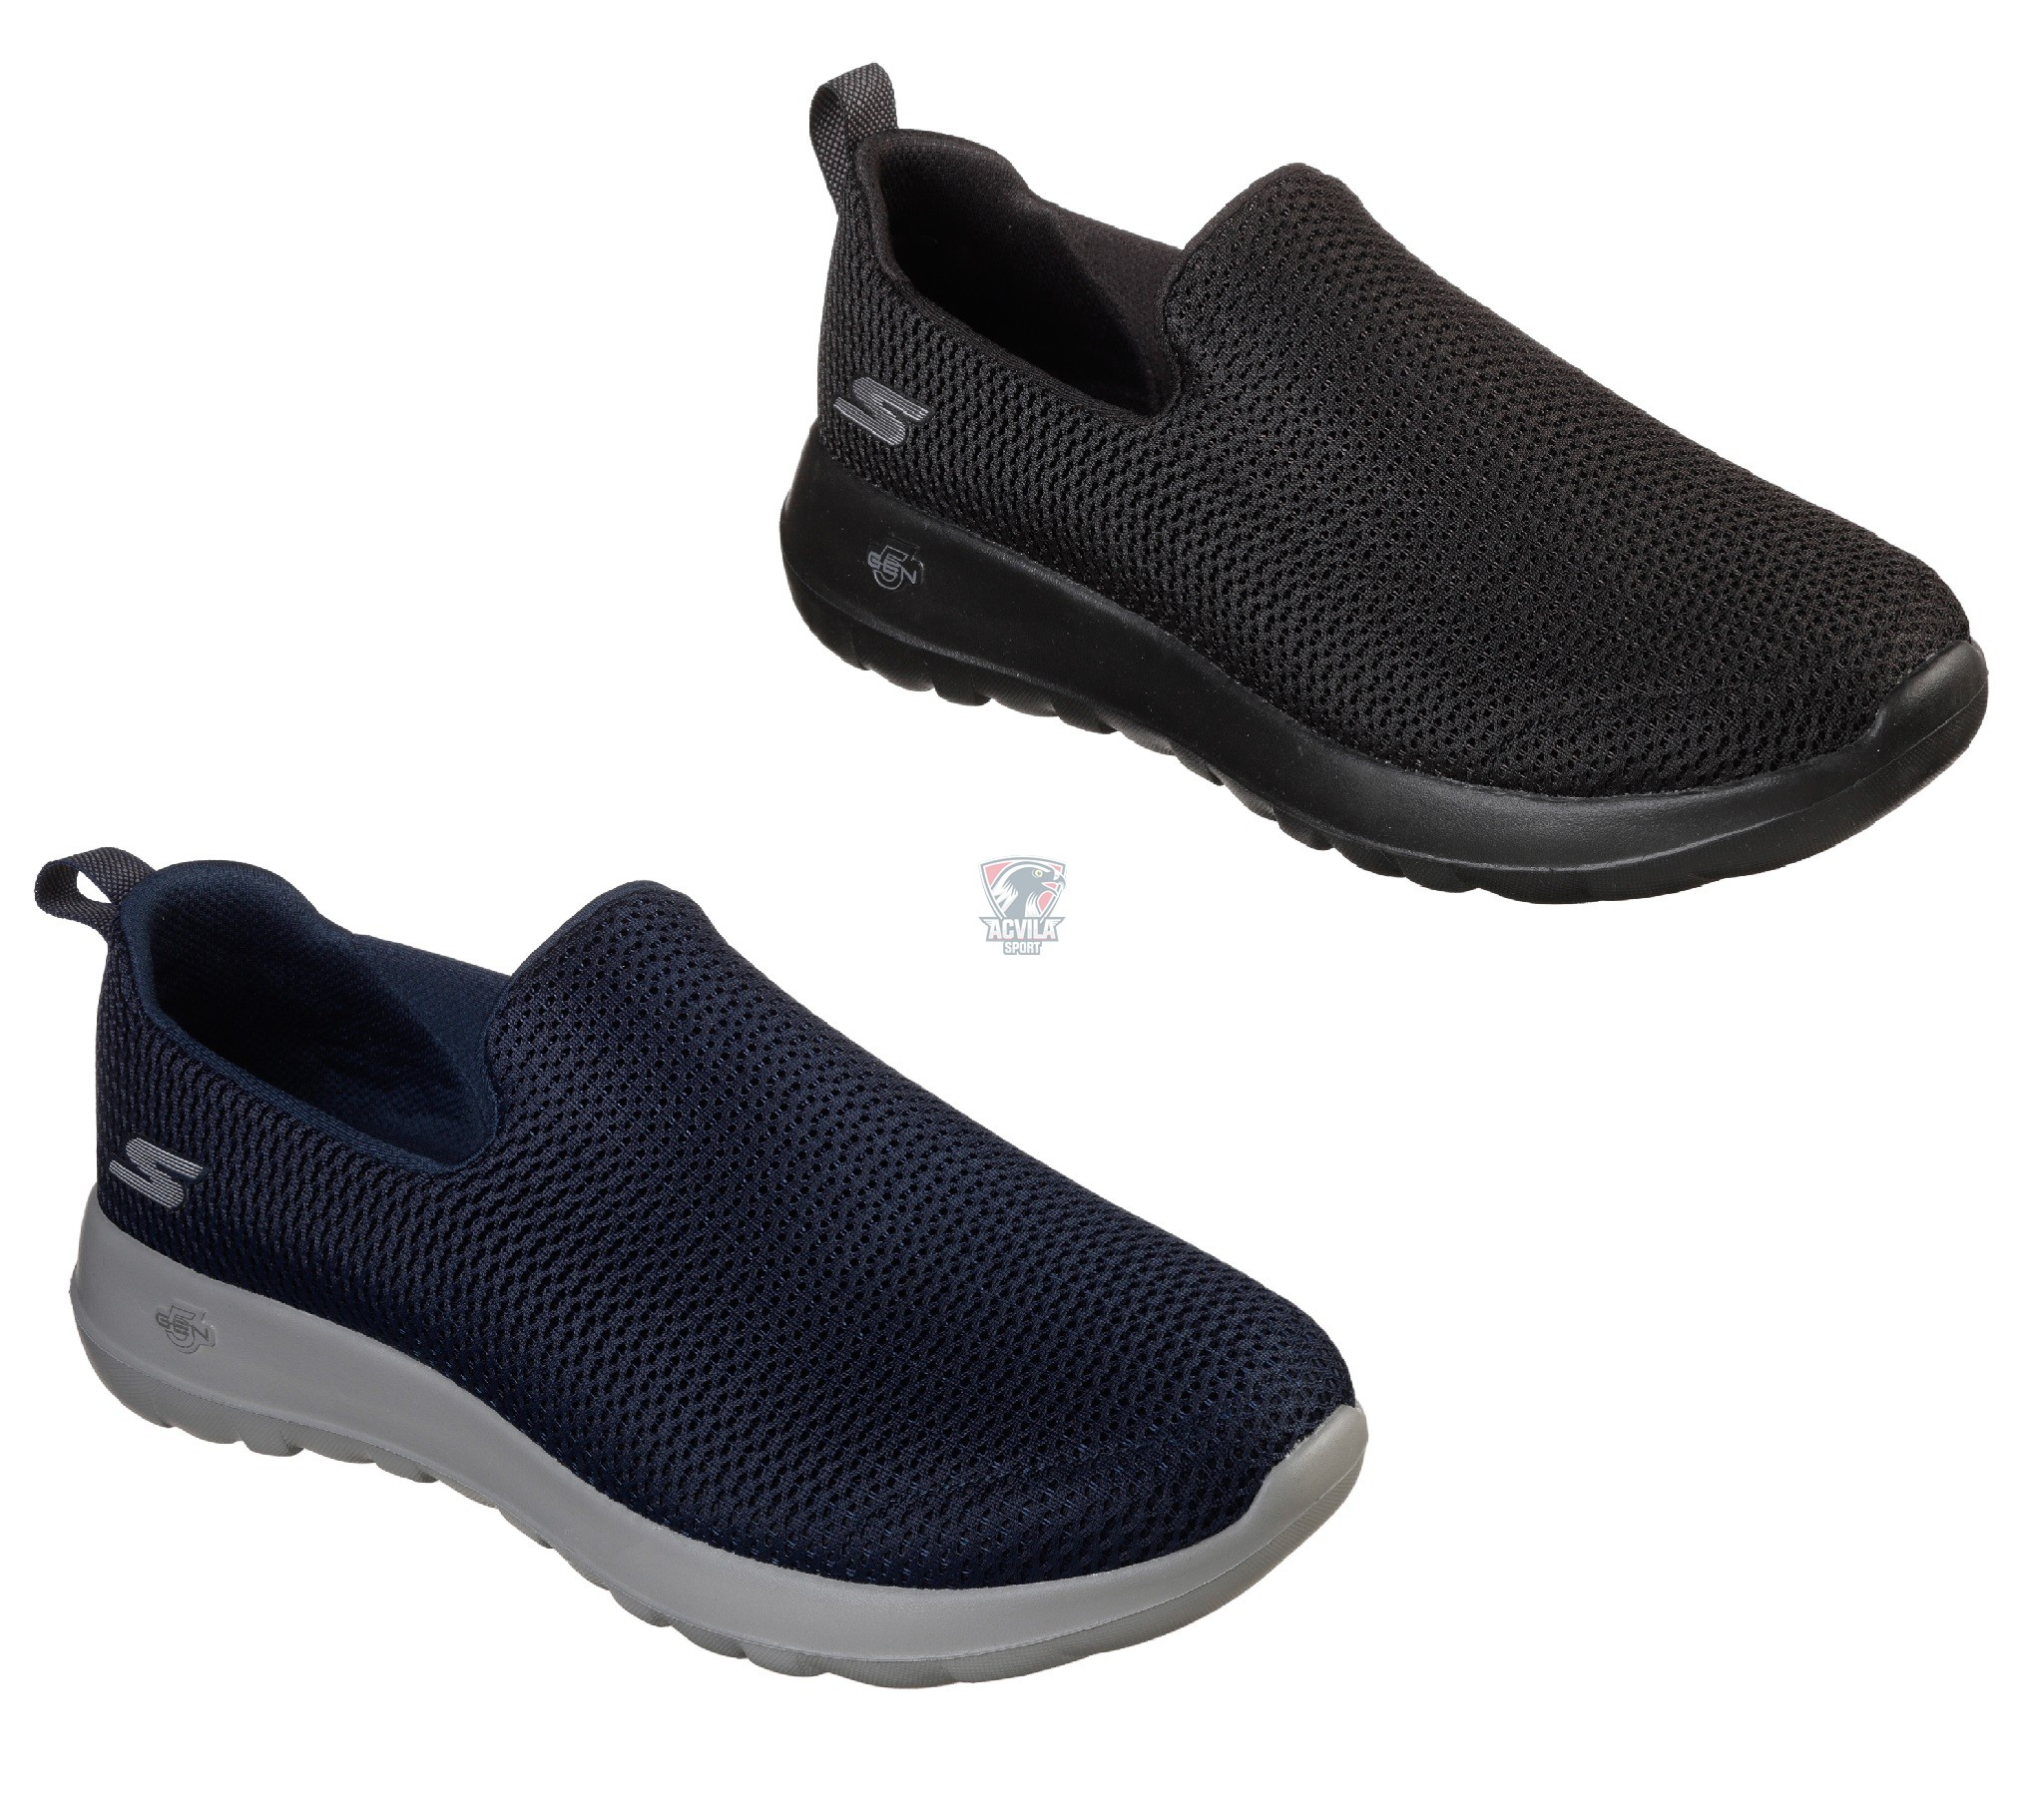 Photo acvilasport - Спортивная обувь SKECHERS GO WALK MAX